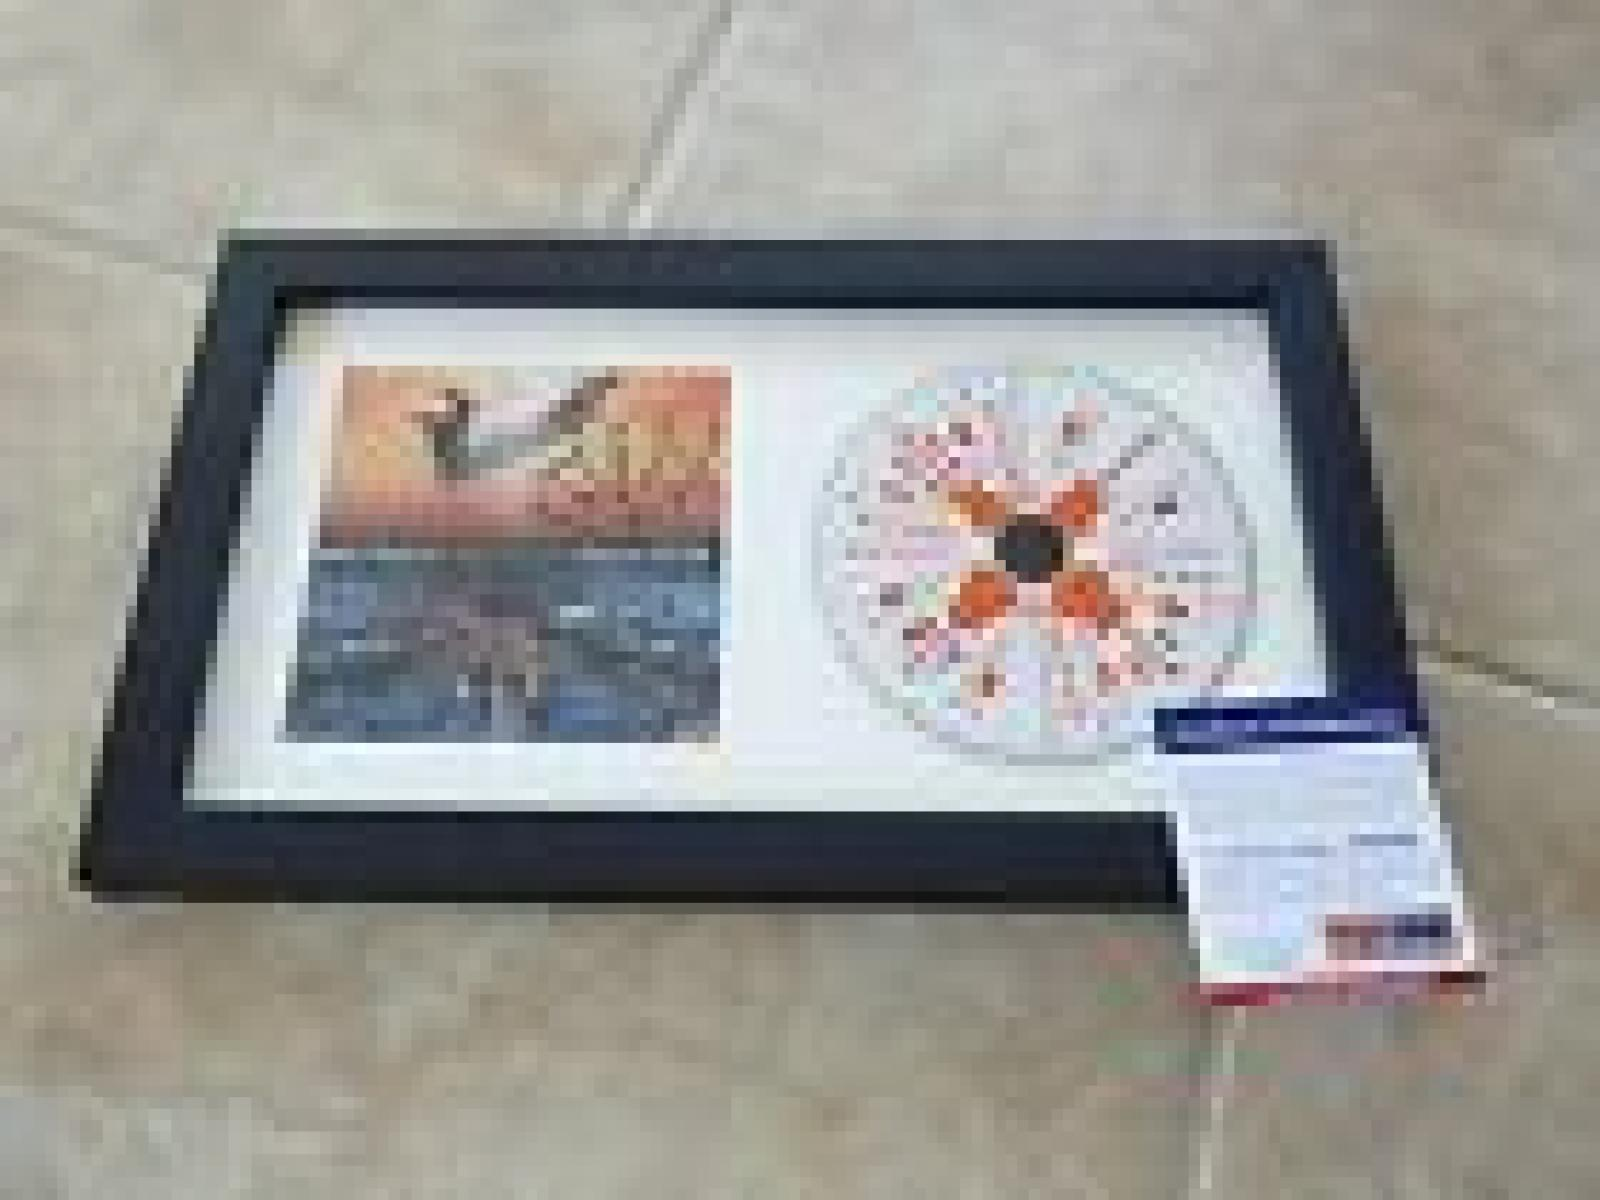 Brad Paisley Sexy Autographed Signed Wheelhouse Cd Framed Display